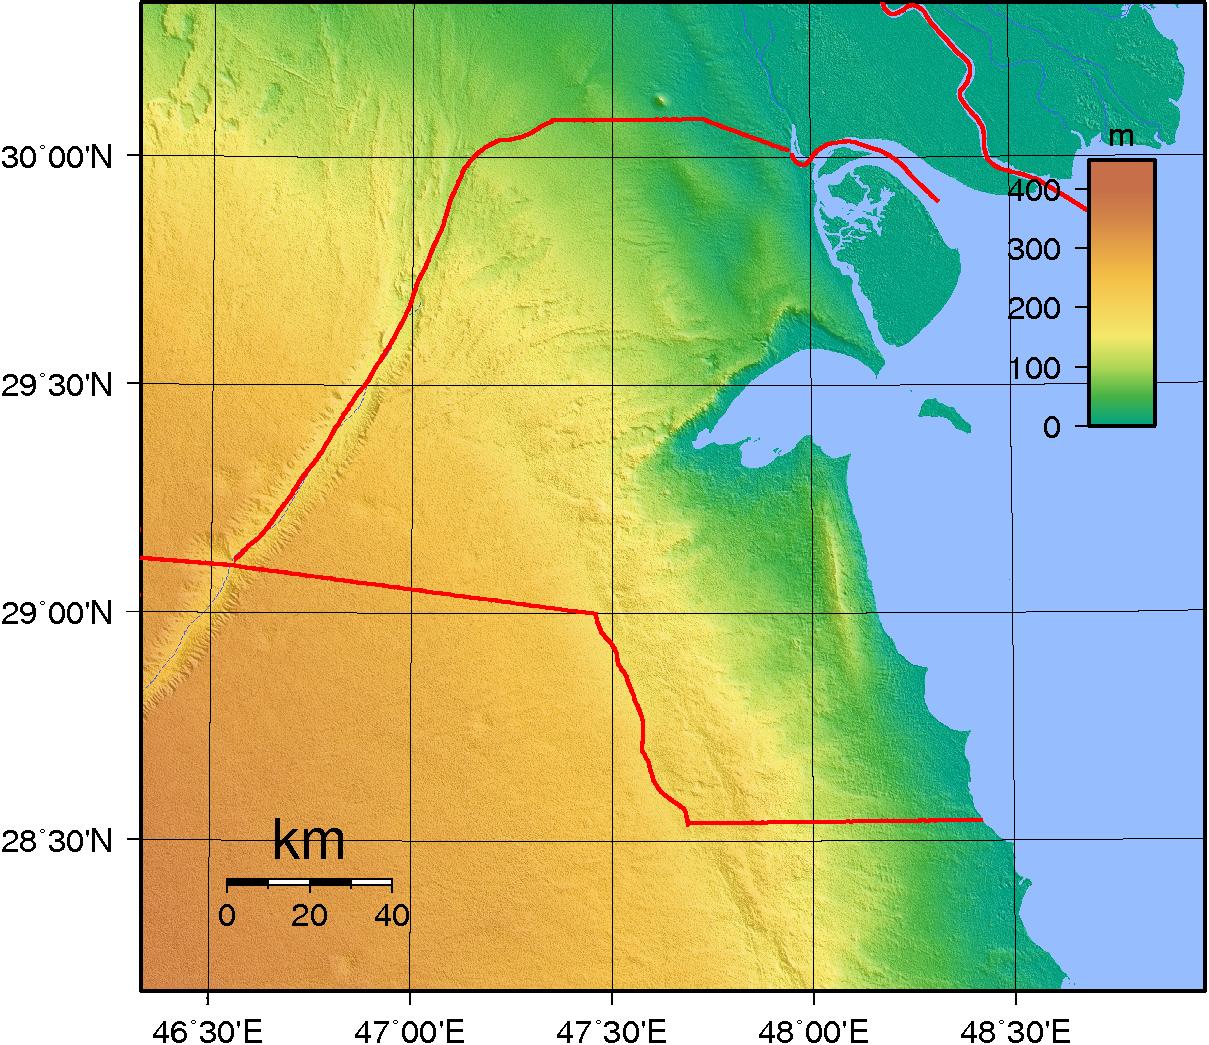 Map of Kuwait (Topography) : Weltkarte.com - Karten und ...